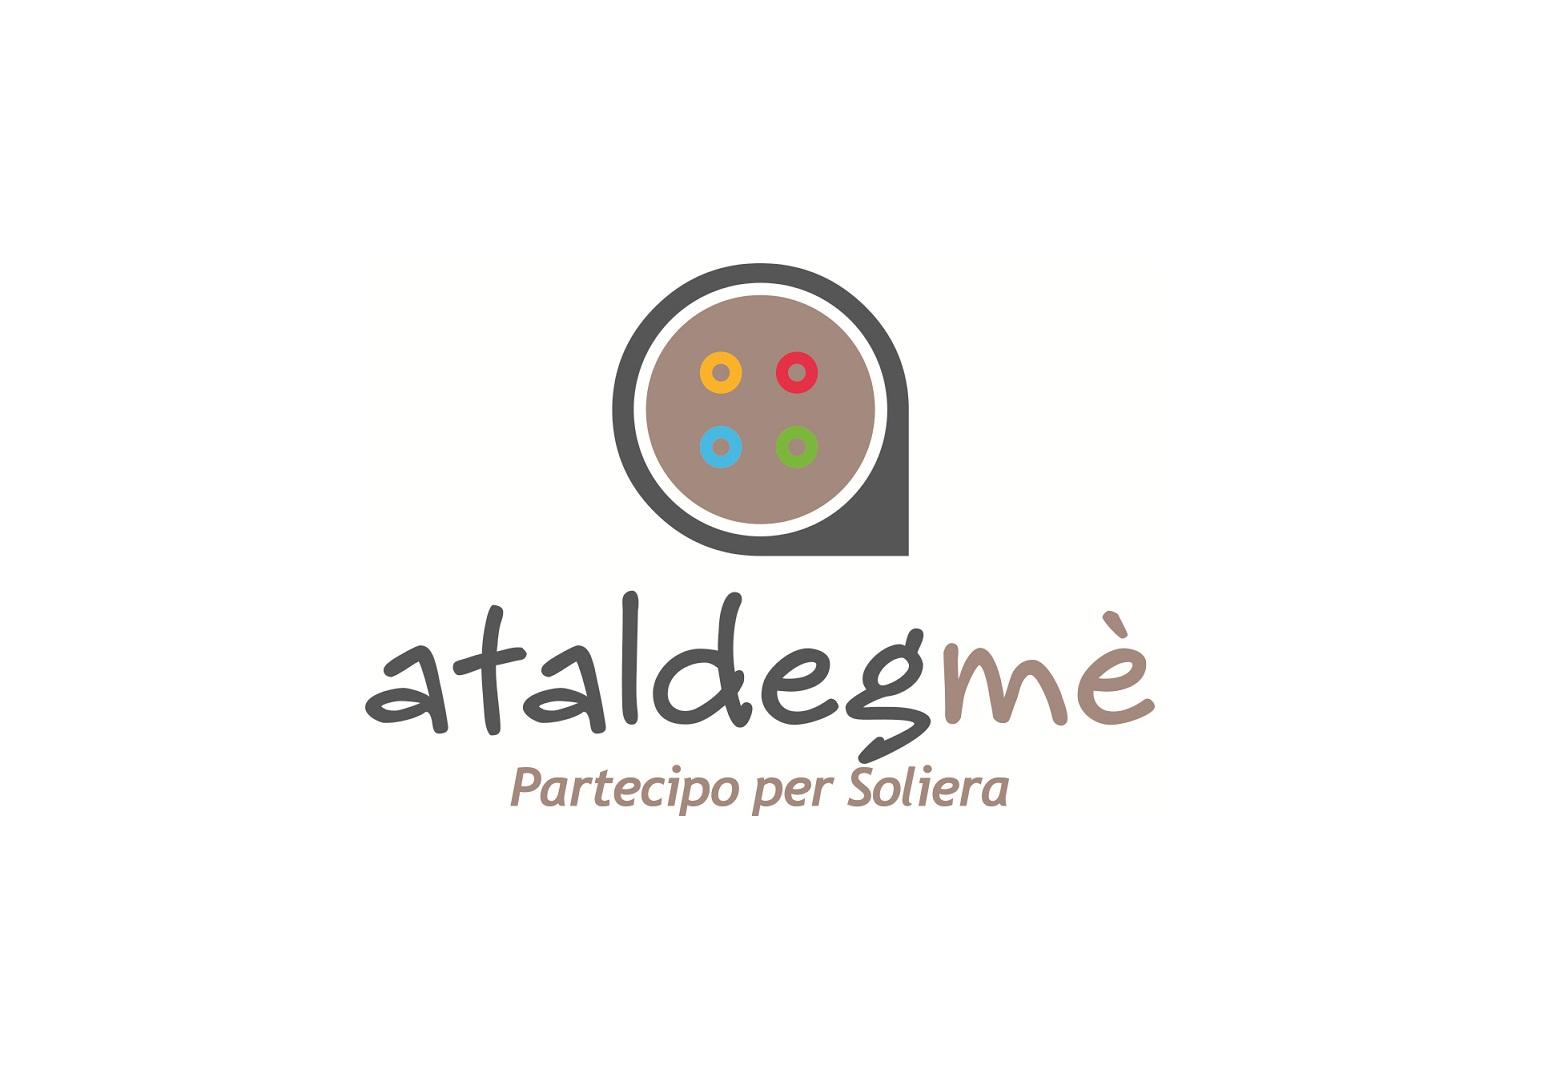 """Ataldegmè. Partecipo per Soliera"""